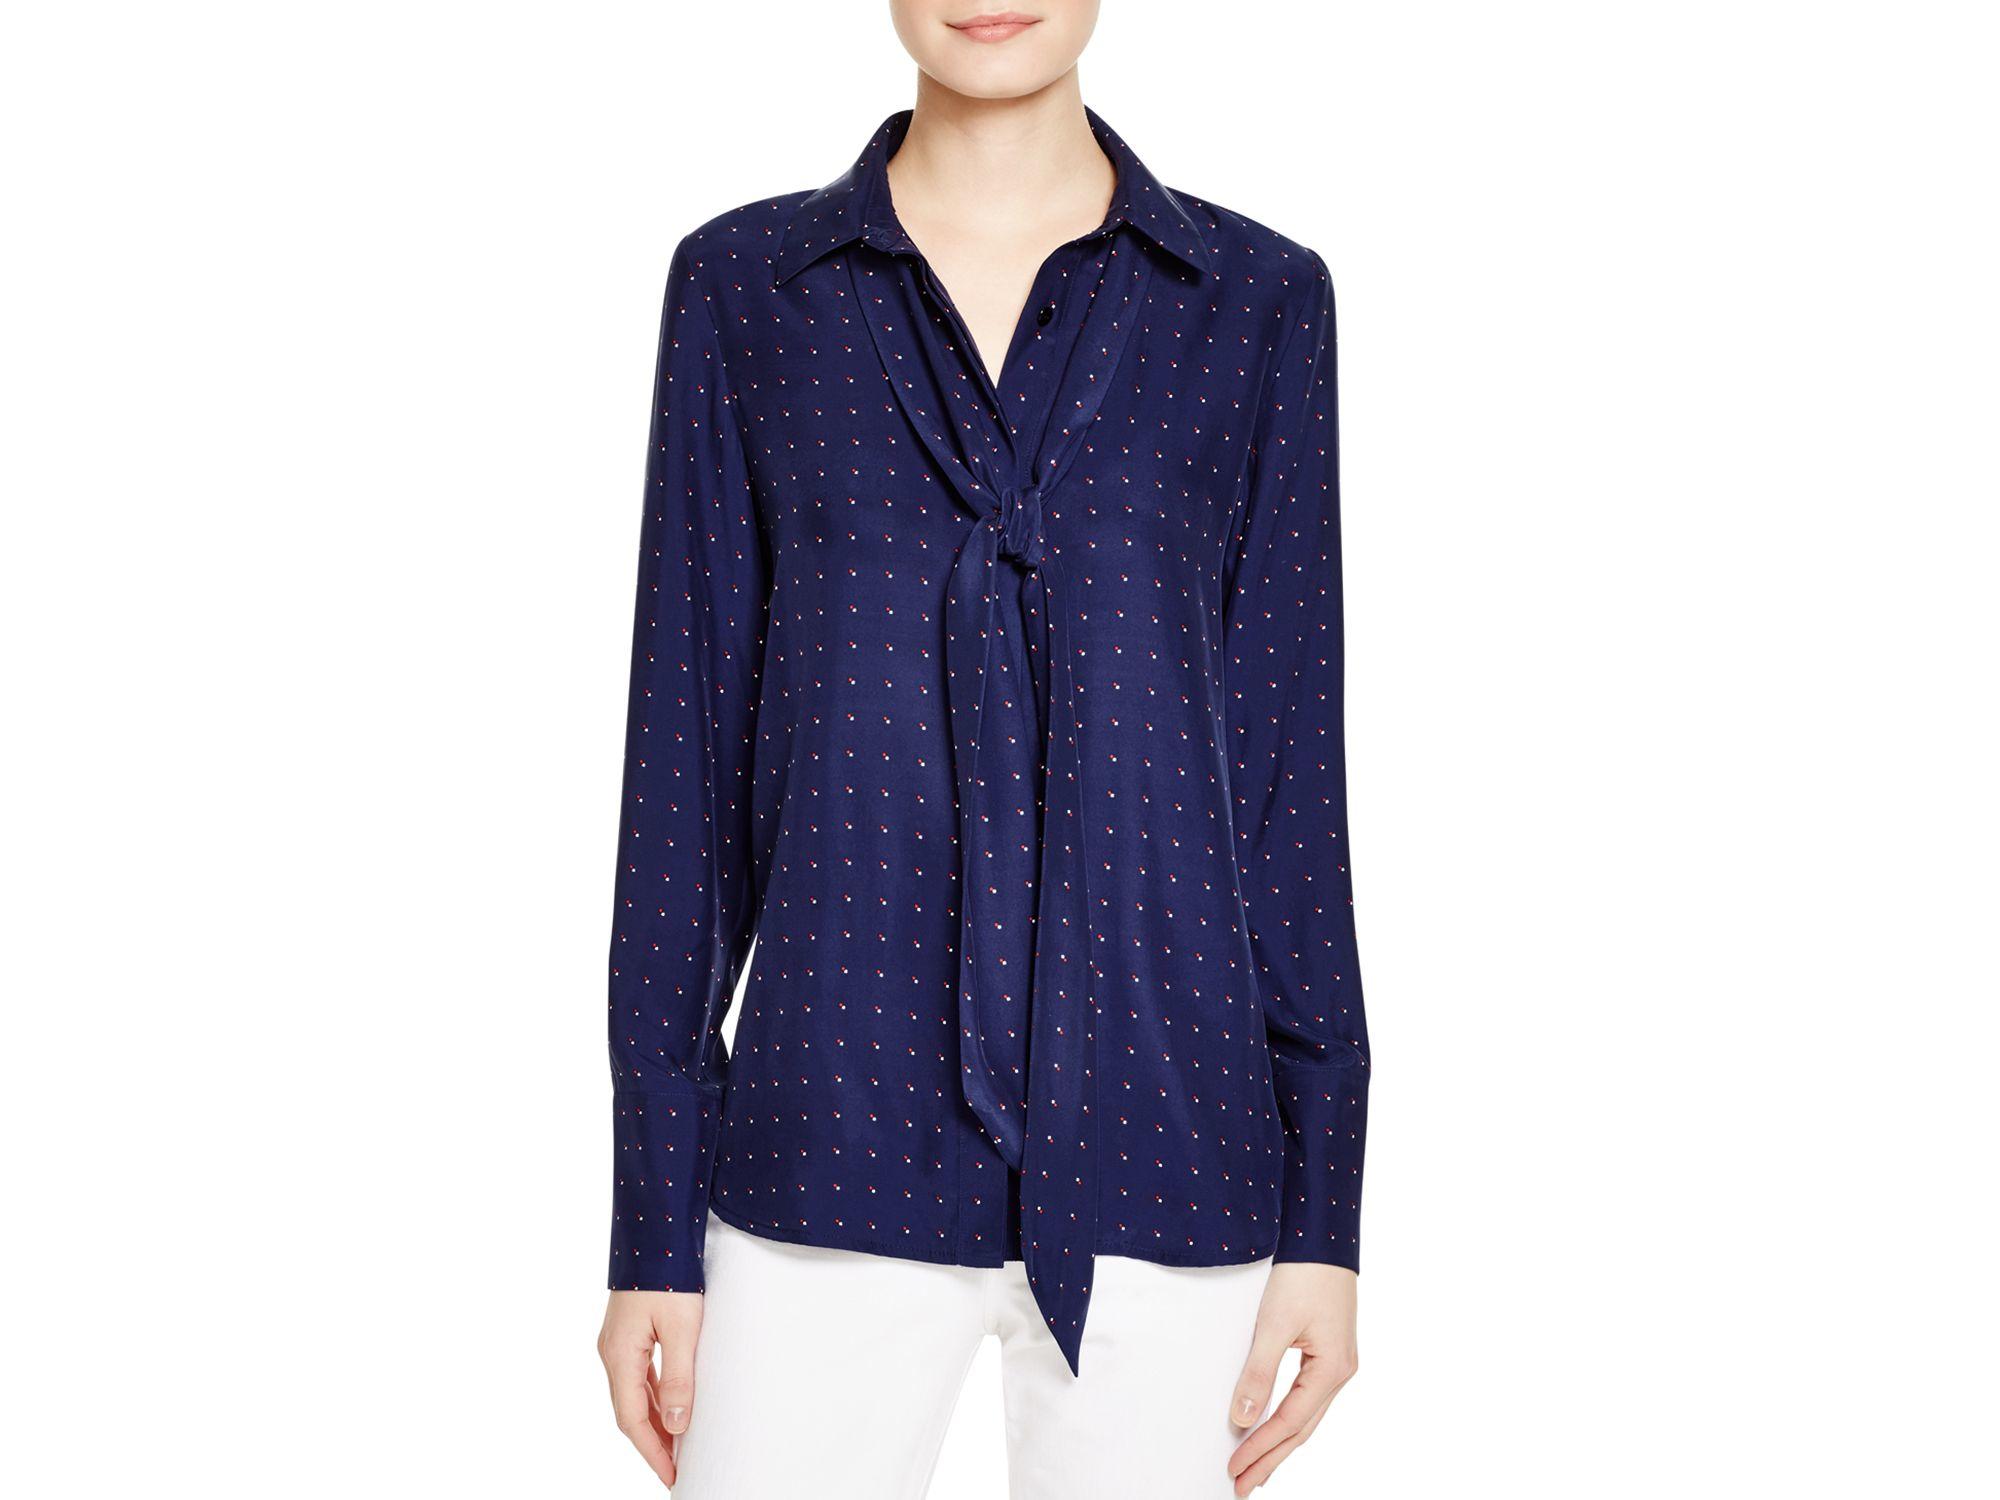 e079a5ed185ac Lyst - FRAME Le Scarf Silk Blouse in Blue